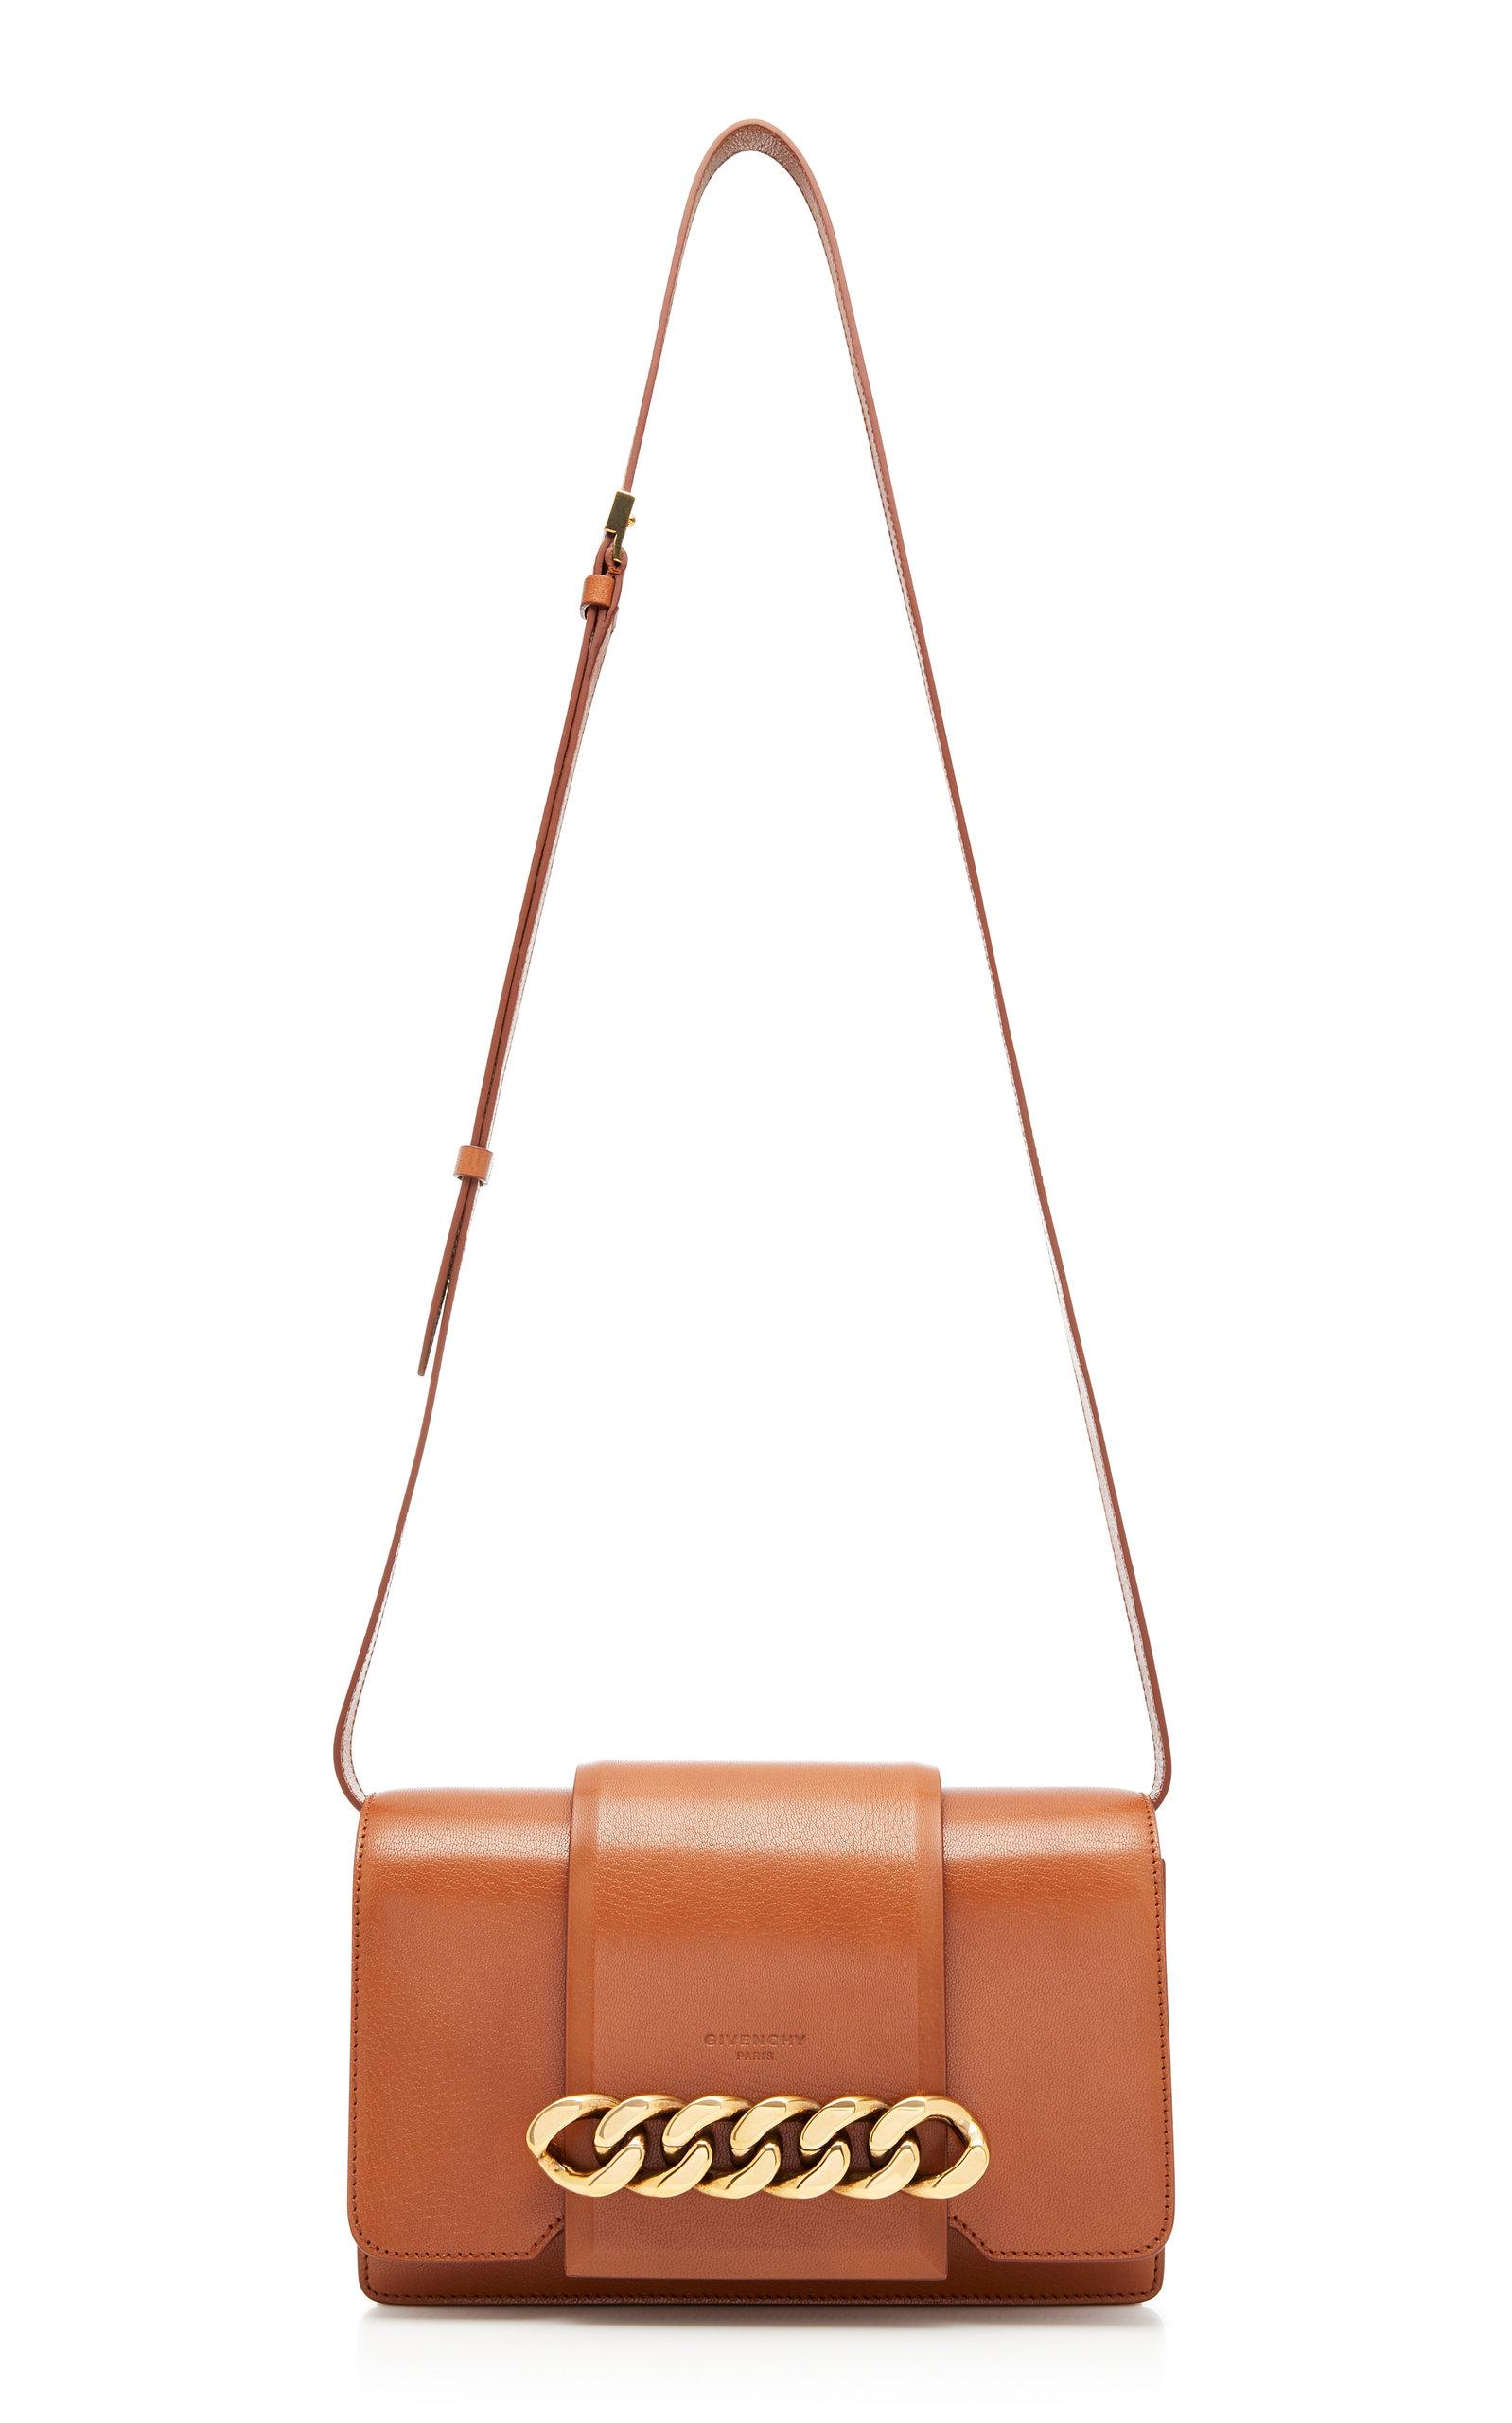 08c8891345 GivenchyInfinity Chain-Trimmed Leather Shoulder Bag. CLOSE. Loading. Loading